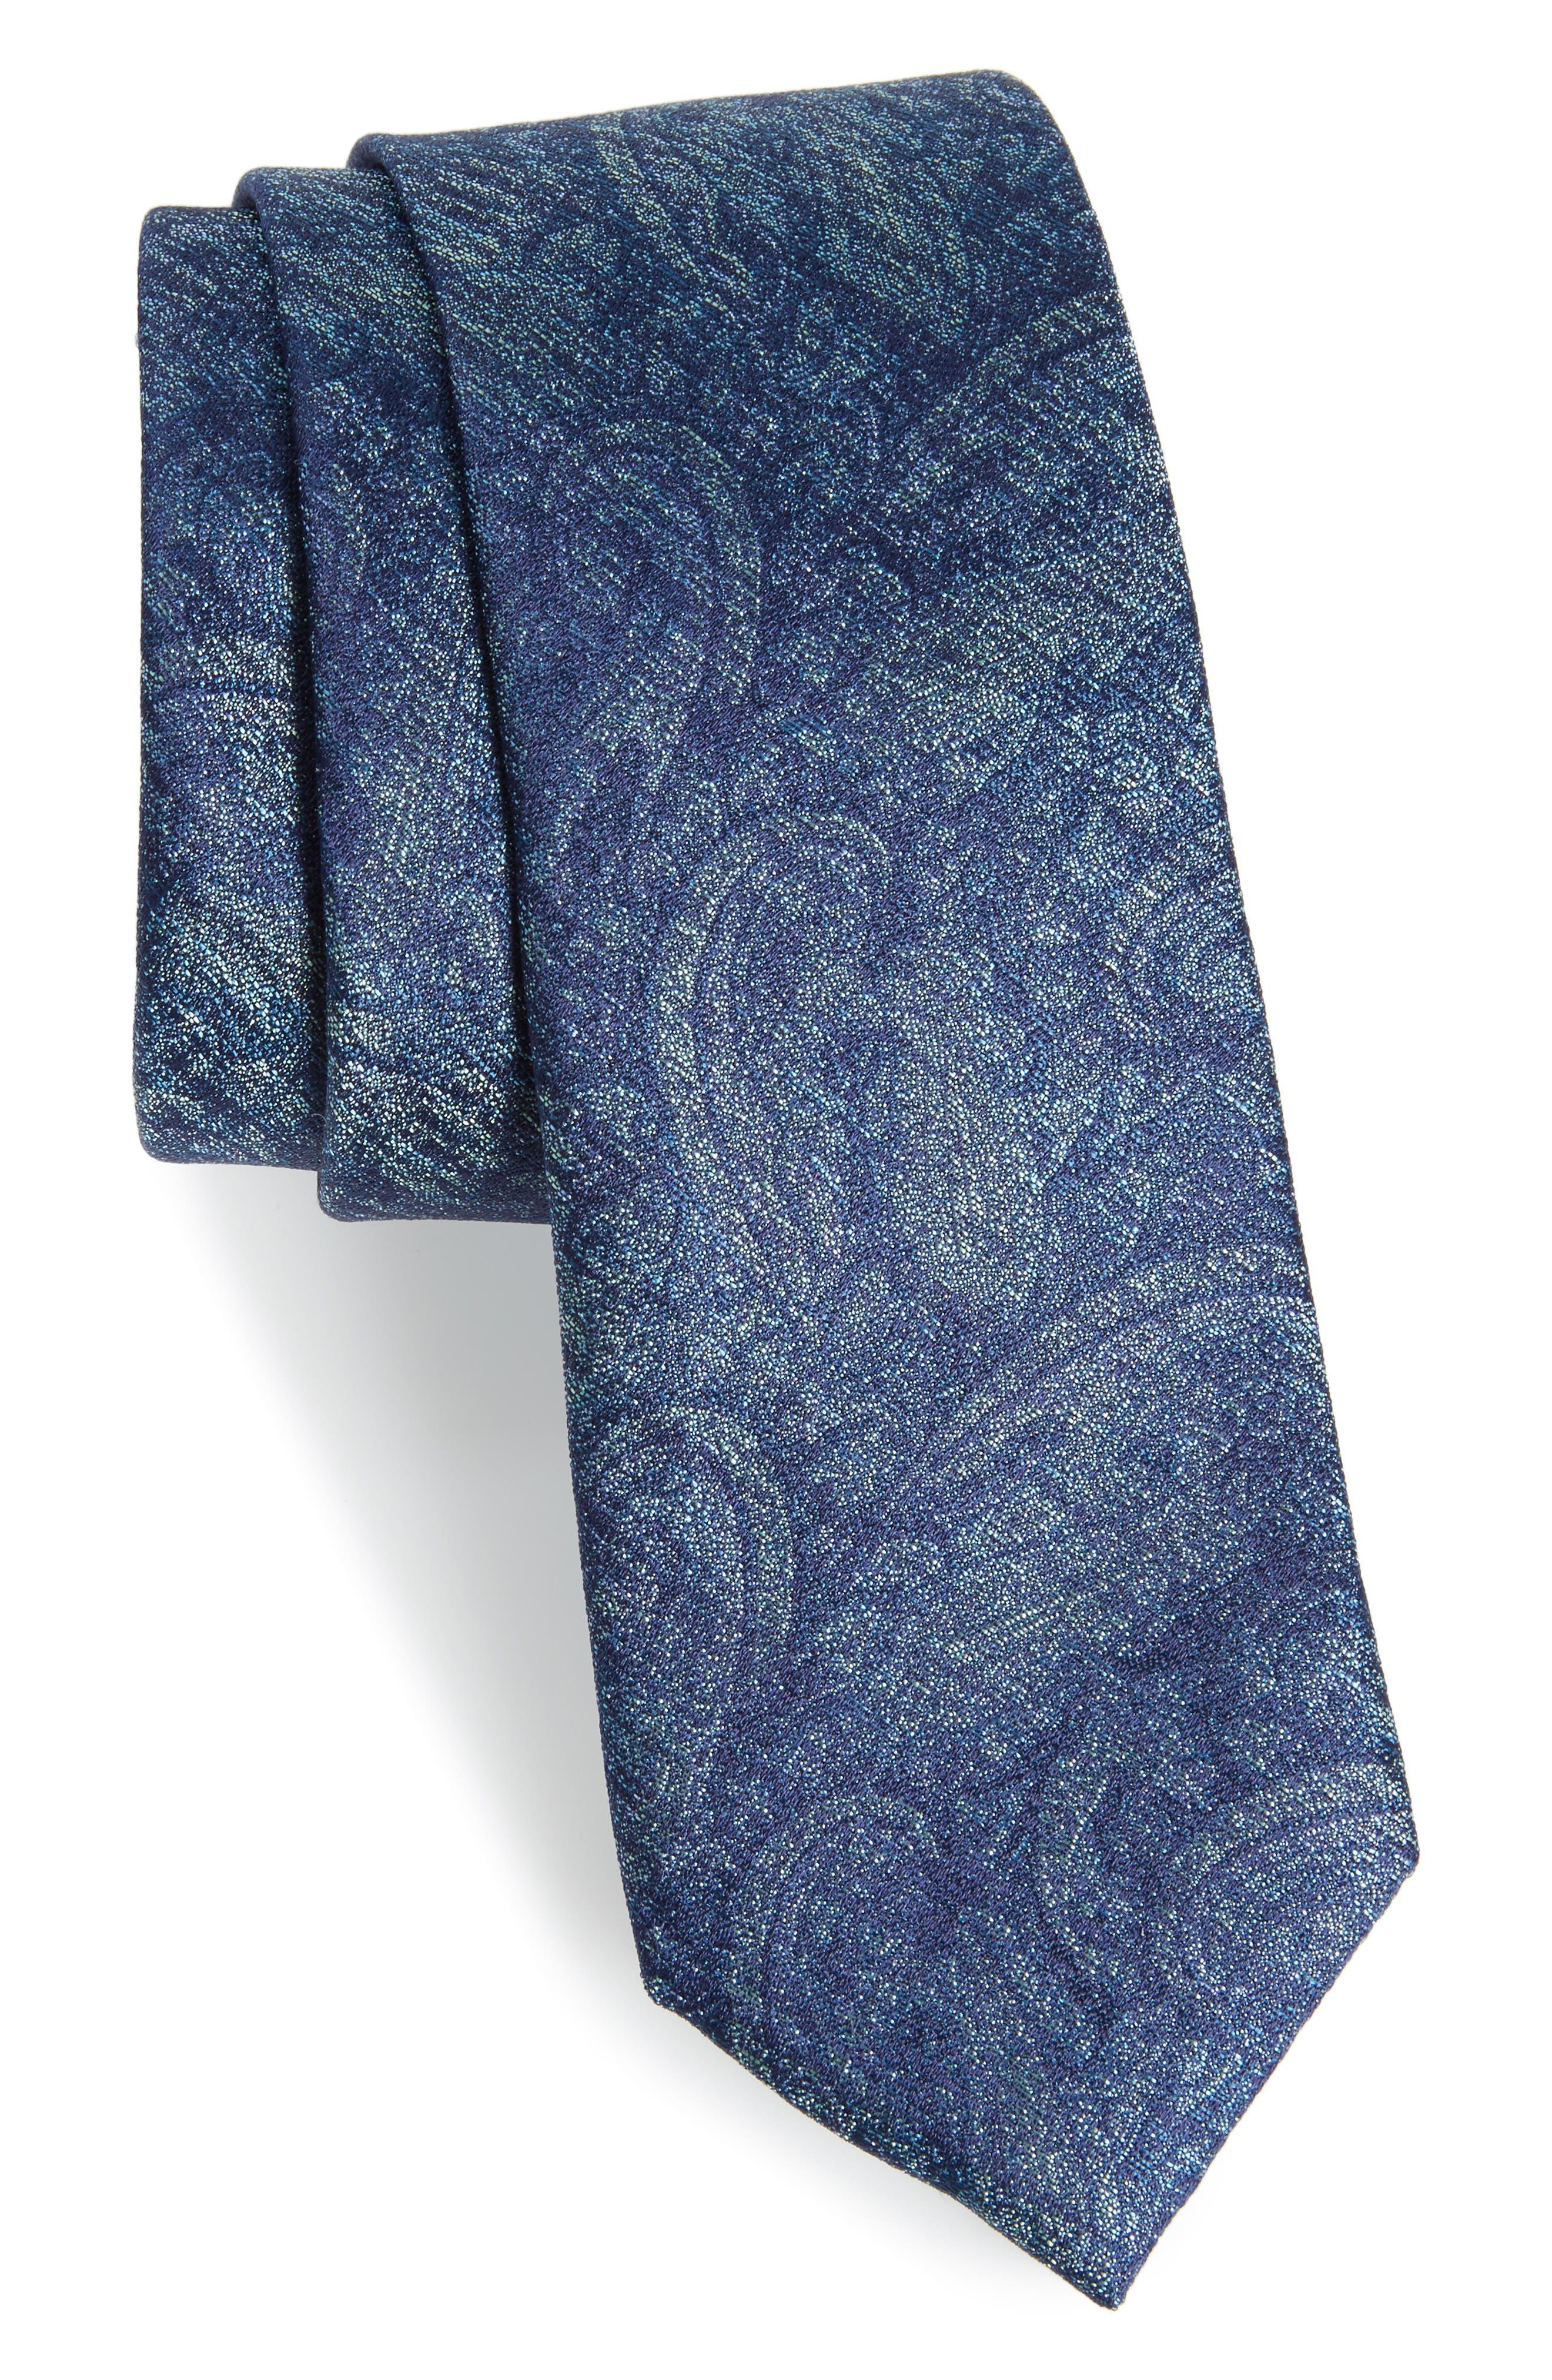 Main Image - Calibrate Alexander Paisley Silk Tie